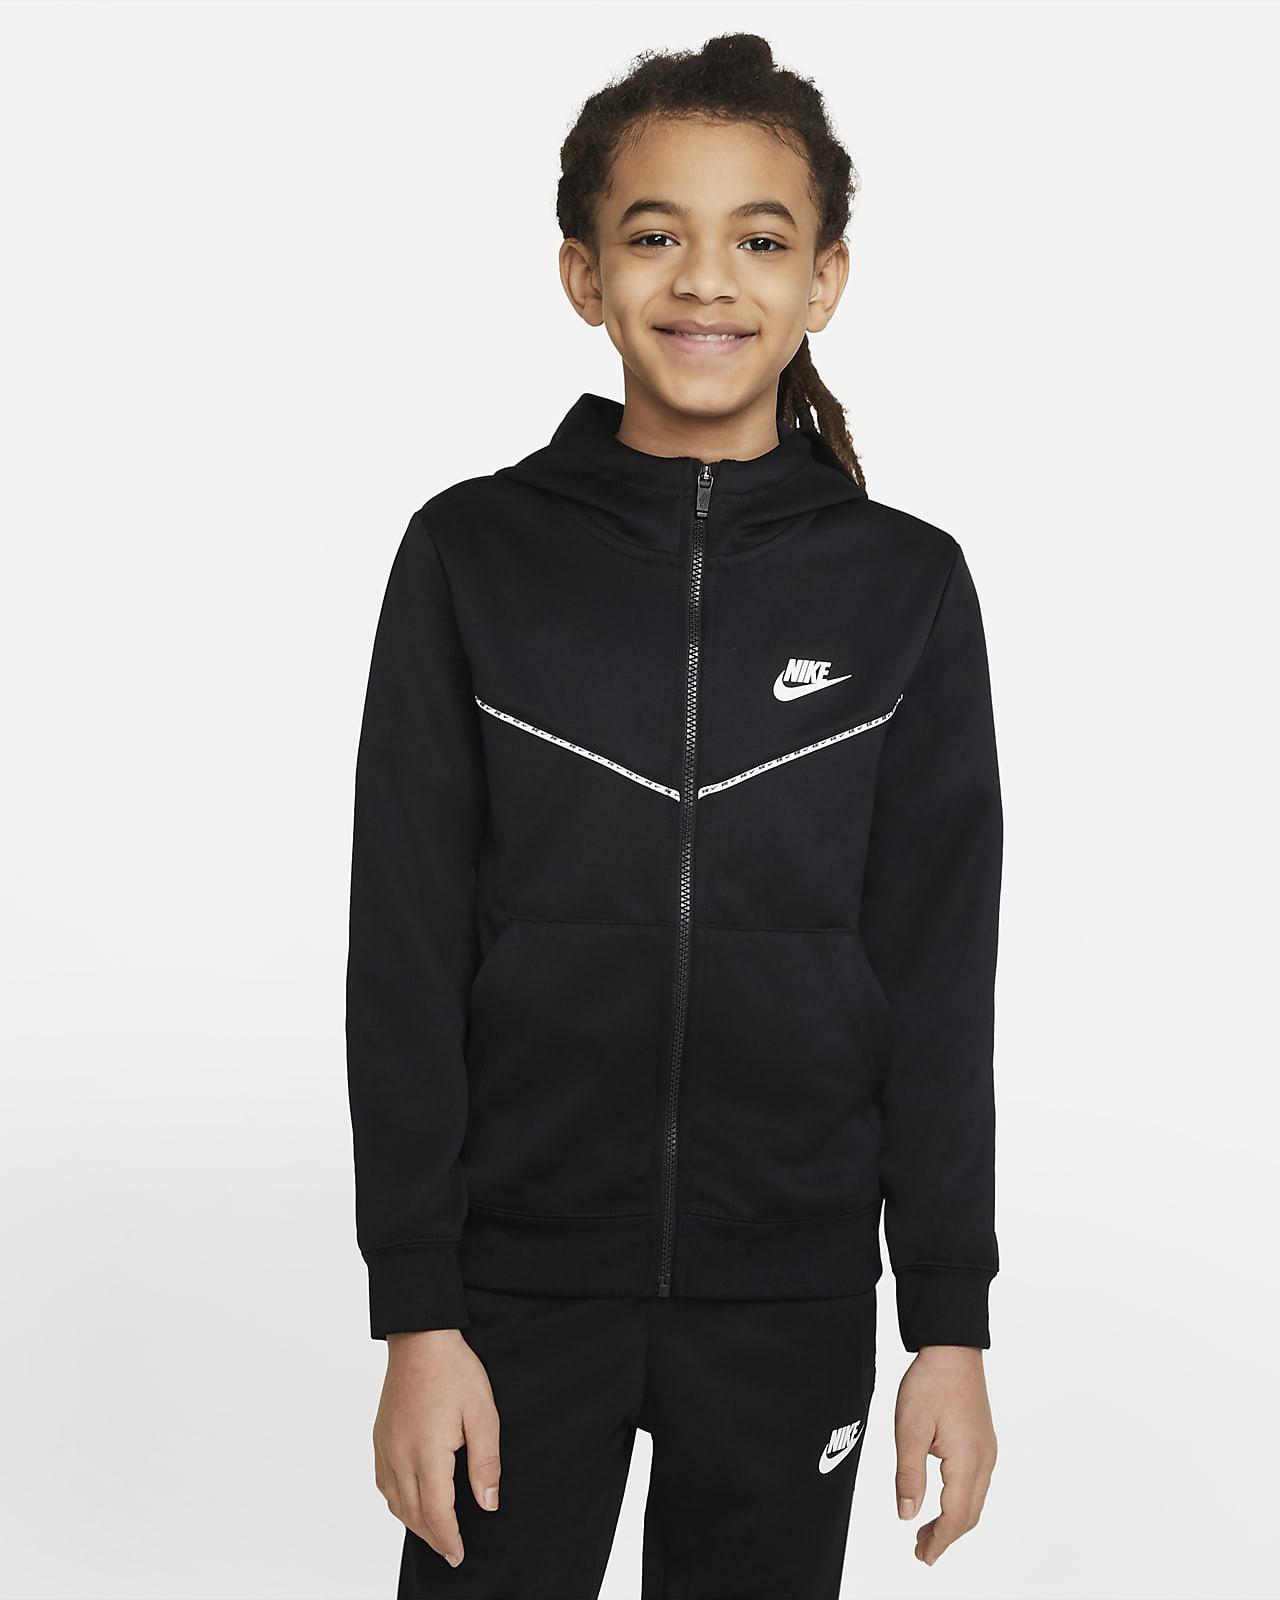 Hoodie com fecho completo Nike Sportswear Júnior (Rapaz)